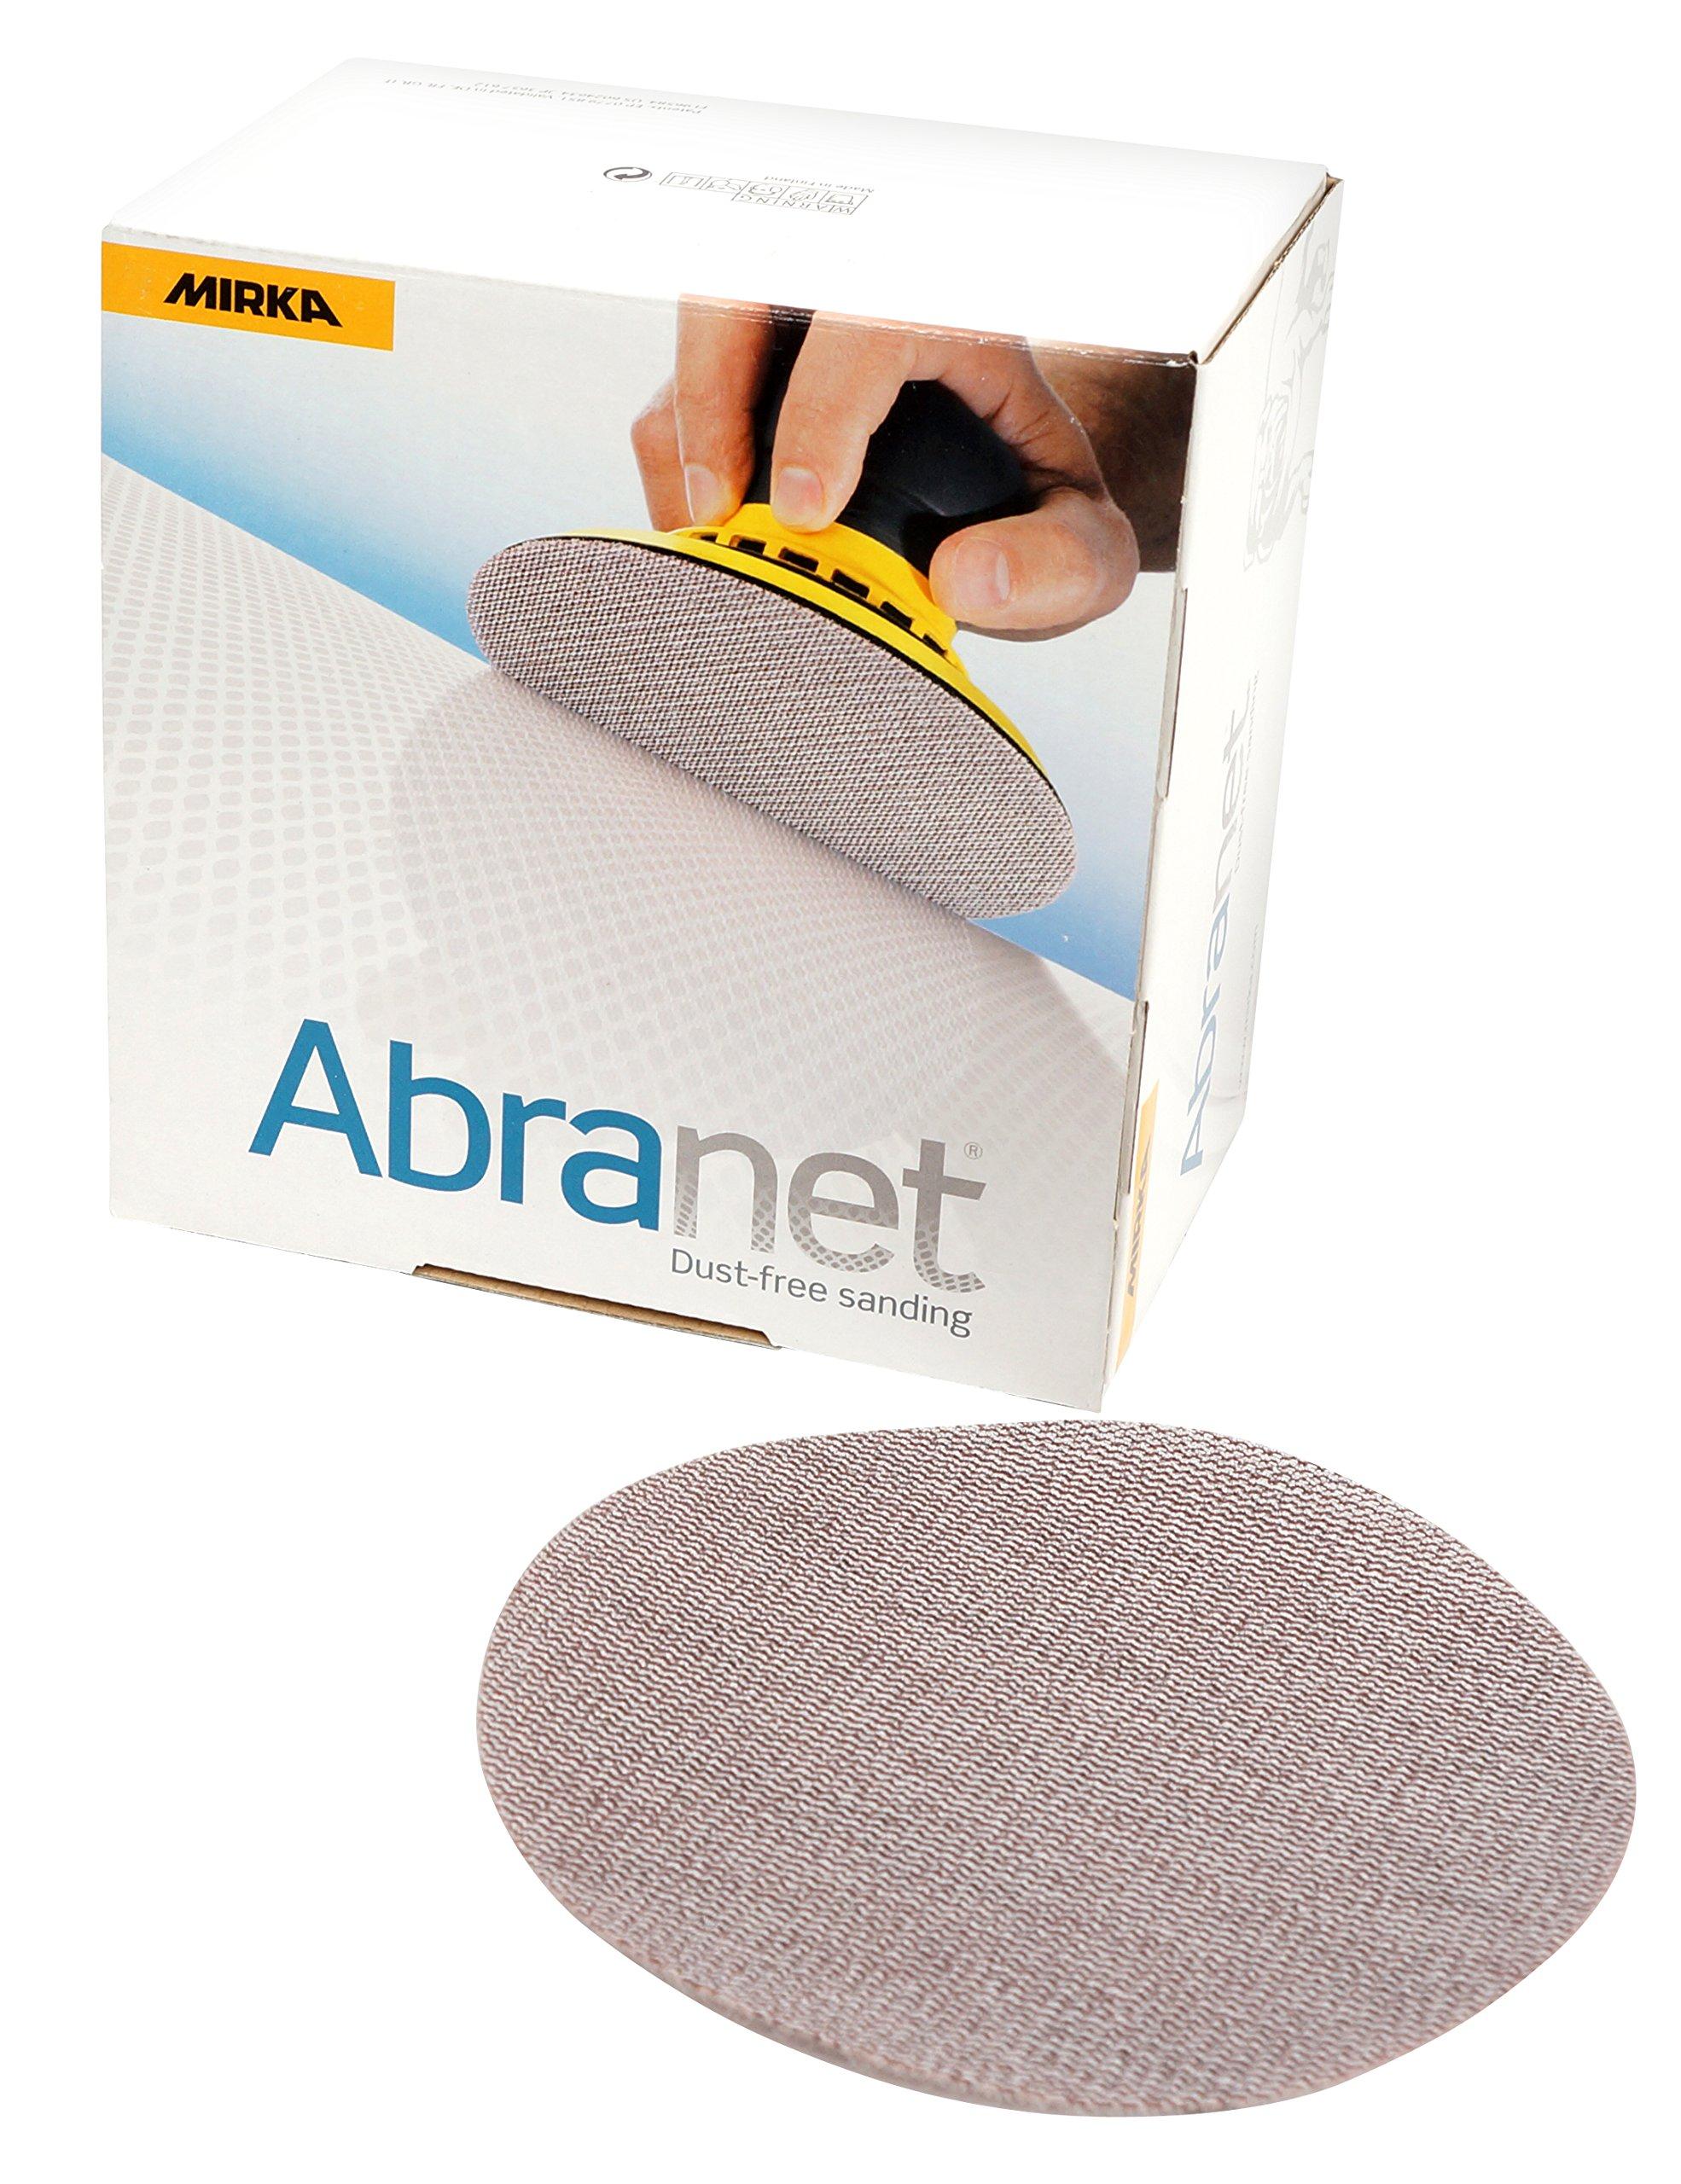 Mirka 9A-232-320 Abranet 5'' 320 Grit Mesh Abrasive Dust Free Sanding Discs (Box of 50 Discs) by Mirka (Image #1)